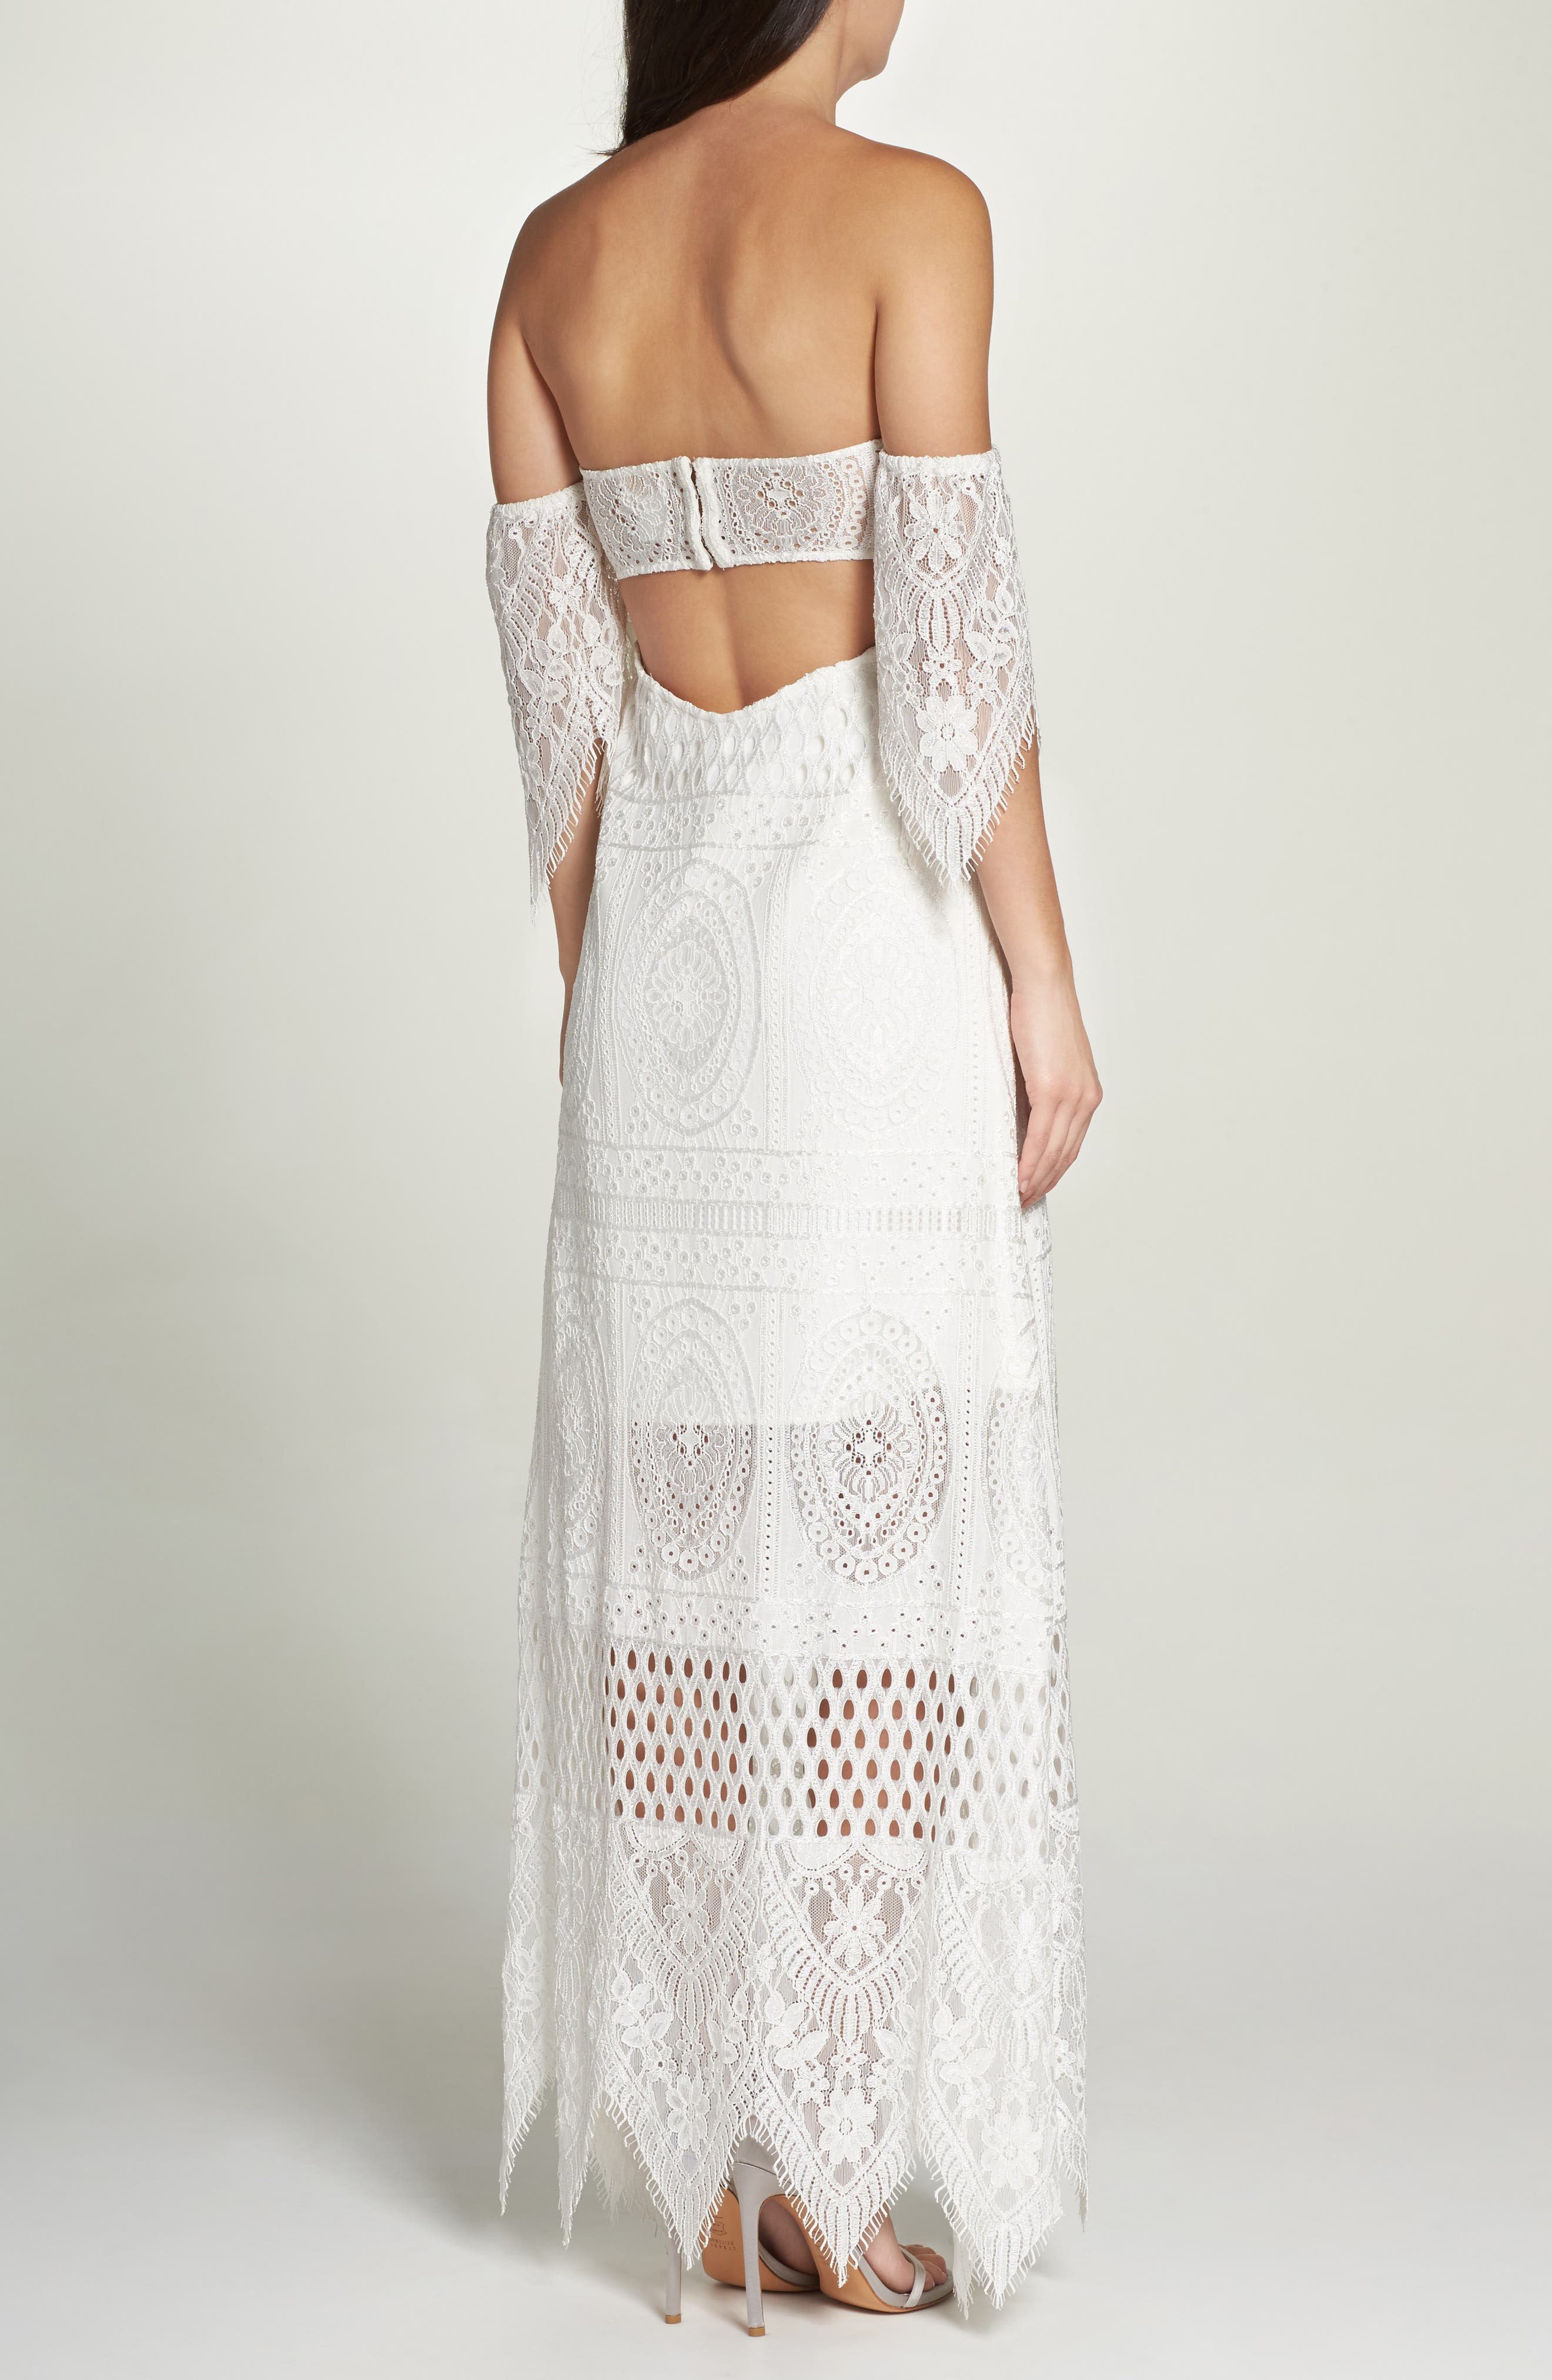 Lace Off the Shoulder Maxi Dress,                             Alternate thumbnail 2, color,                             900